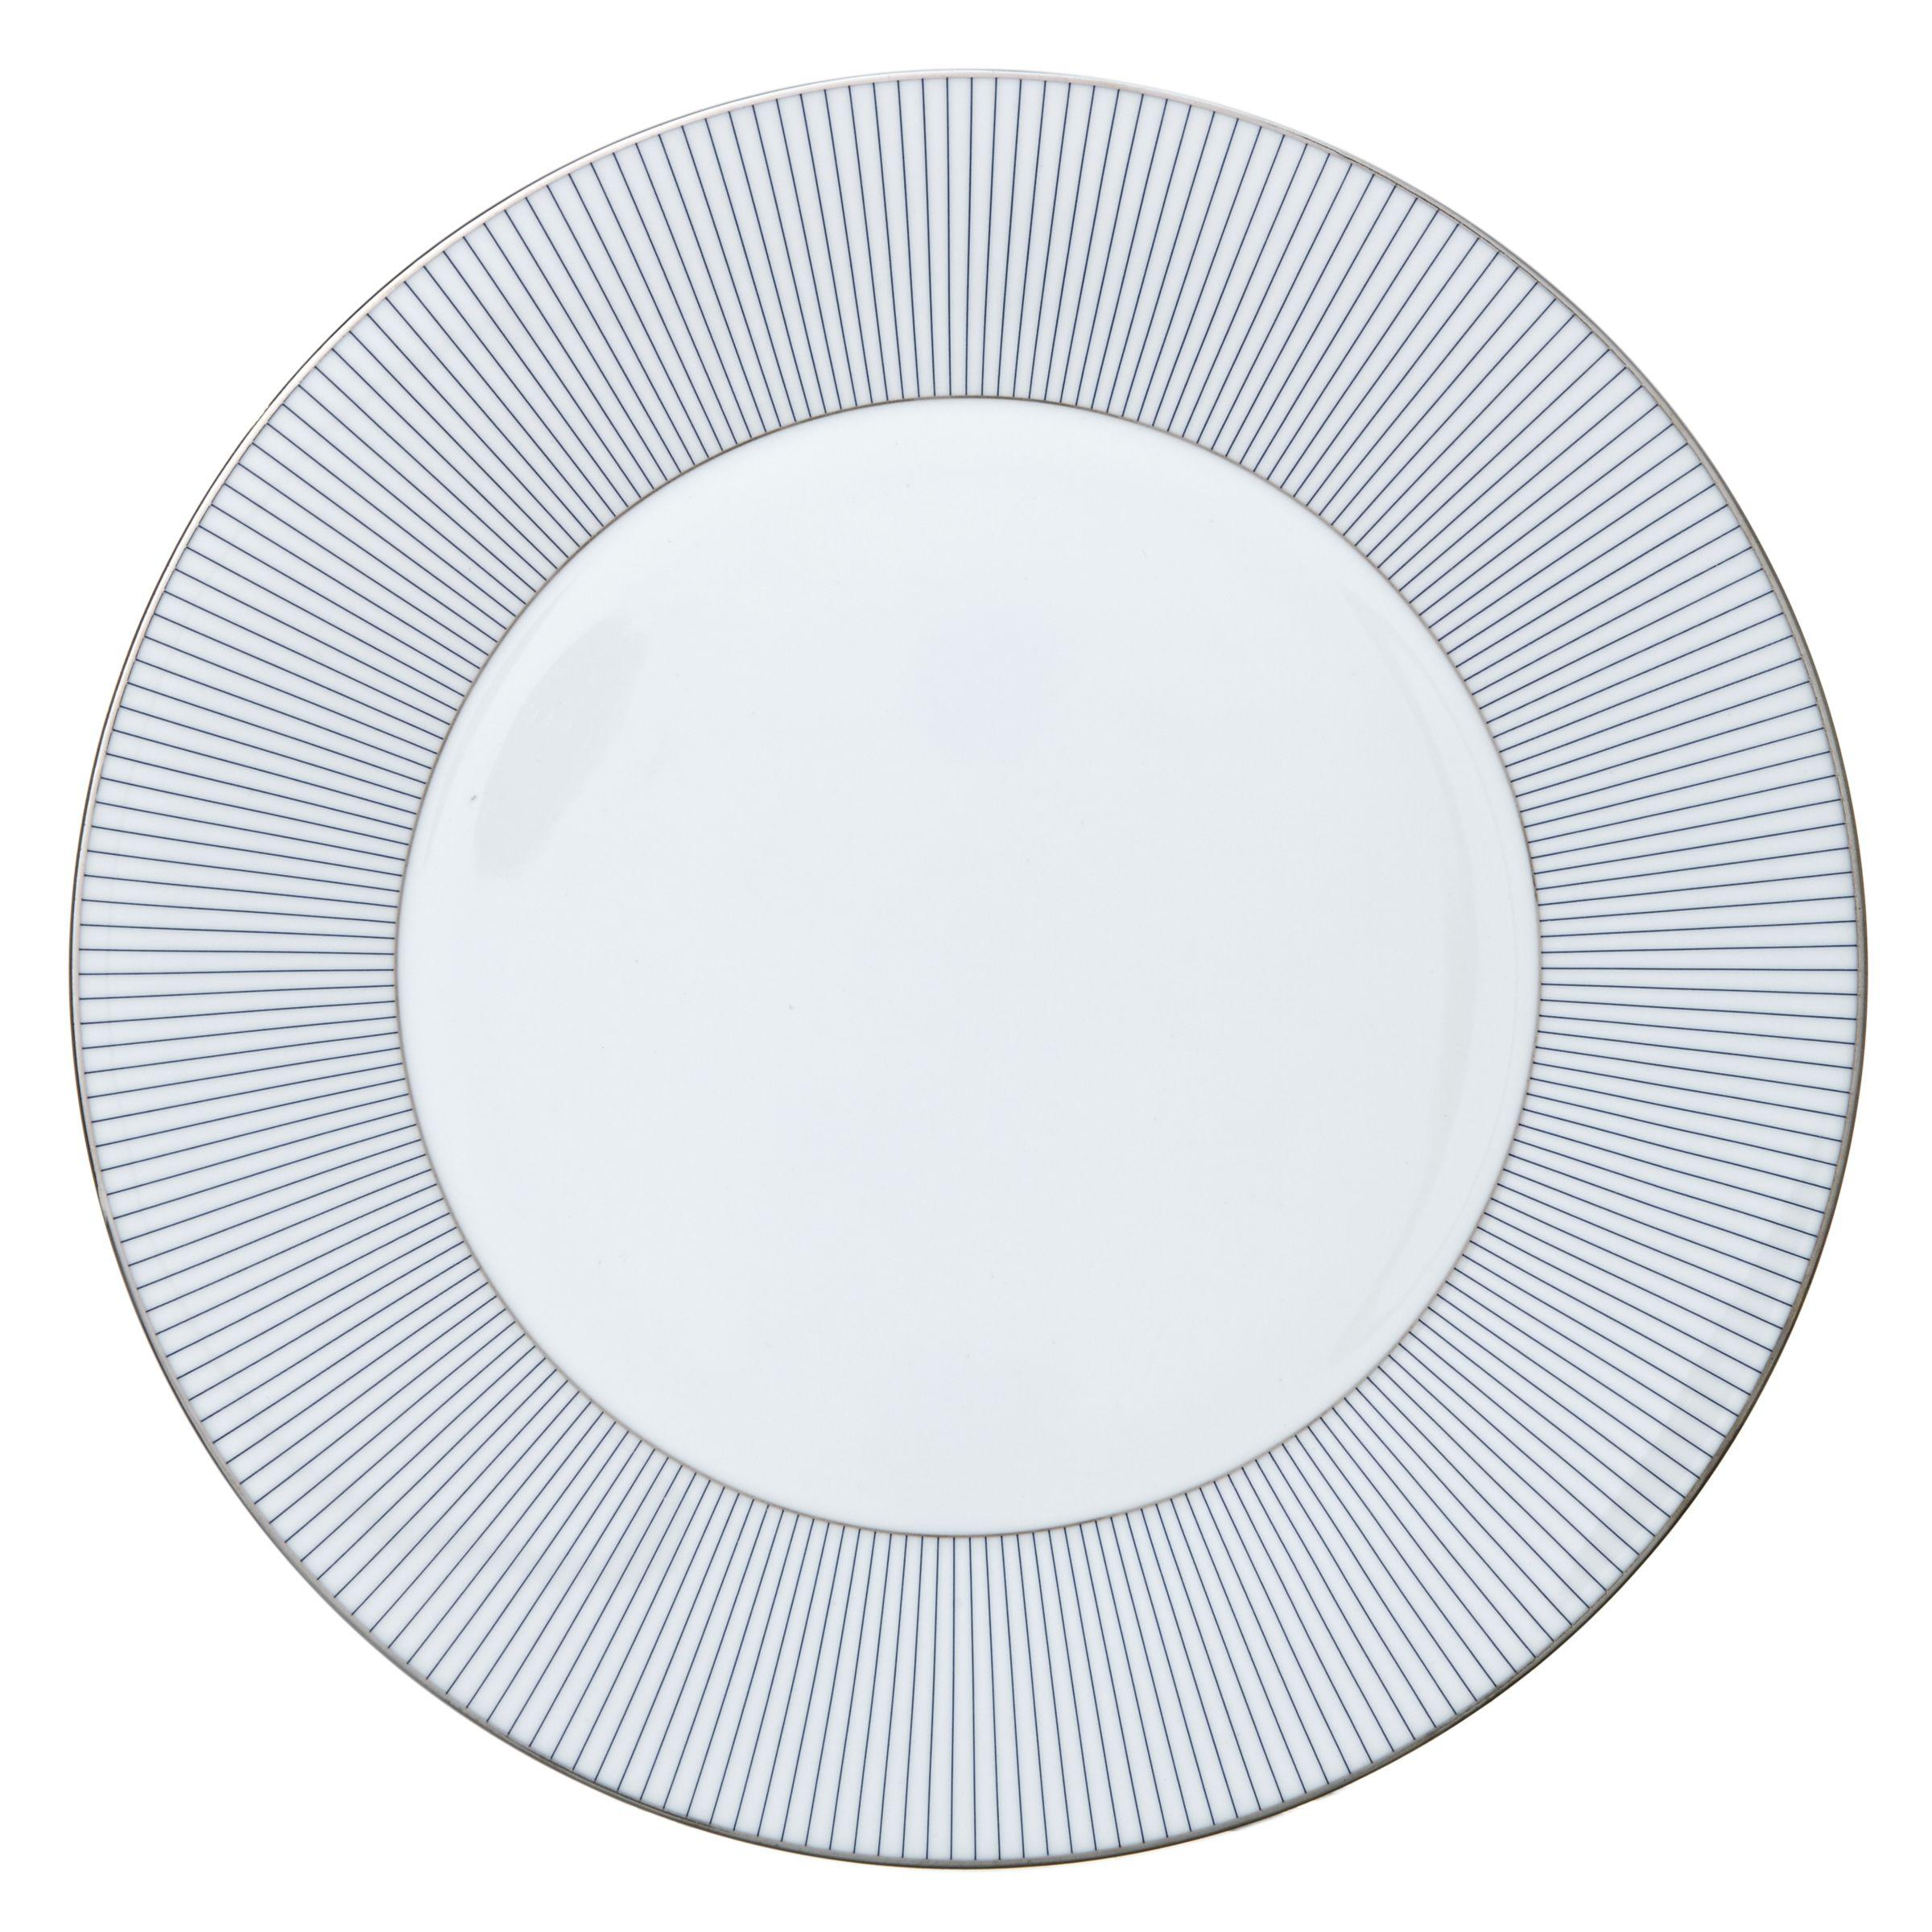 Jasper Conran Jasper Conran for Wedgwood Pinstripe Plate, Multi